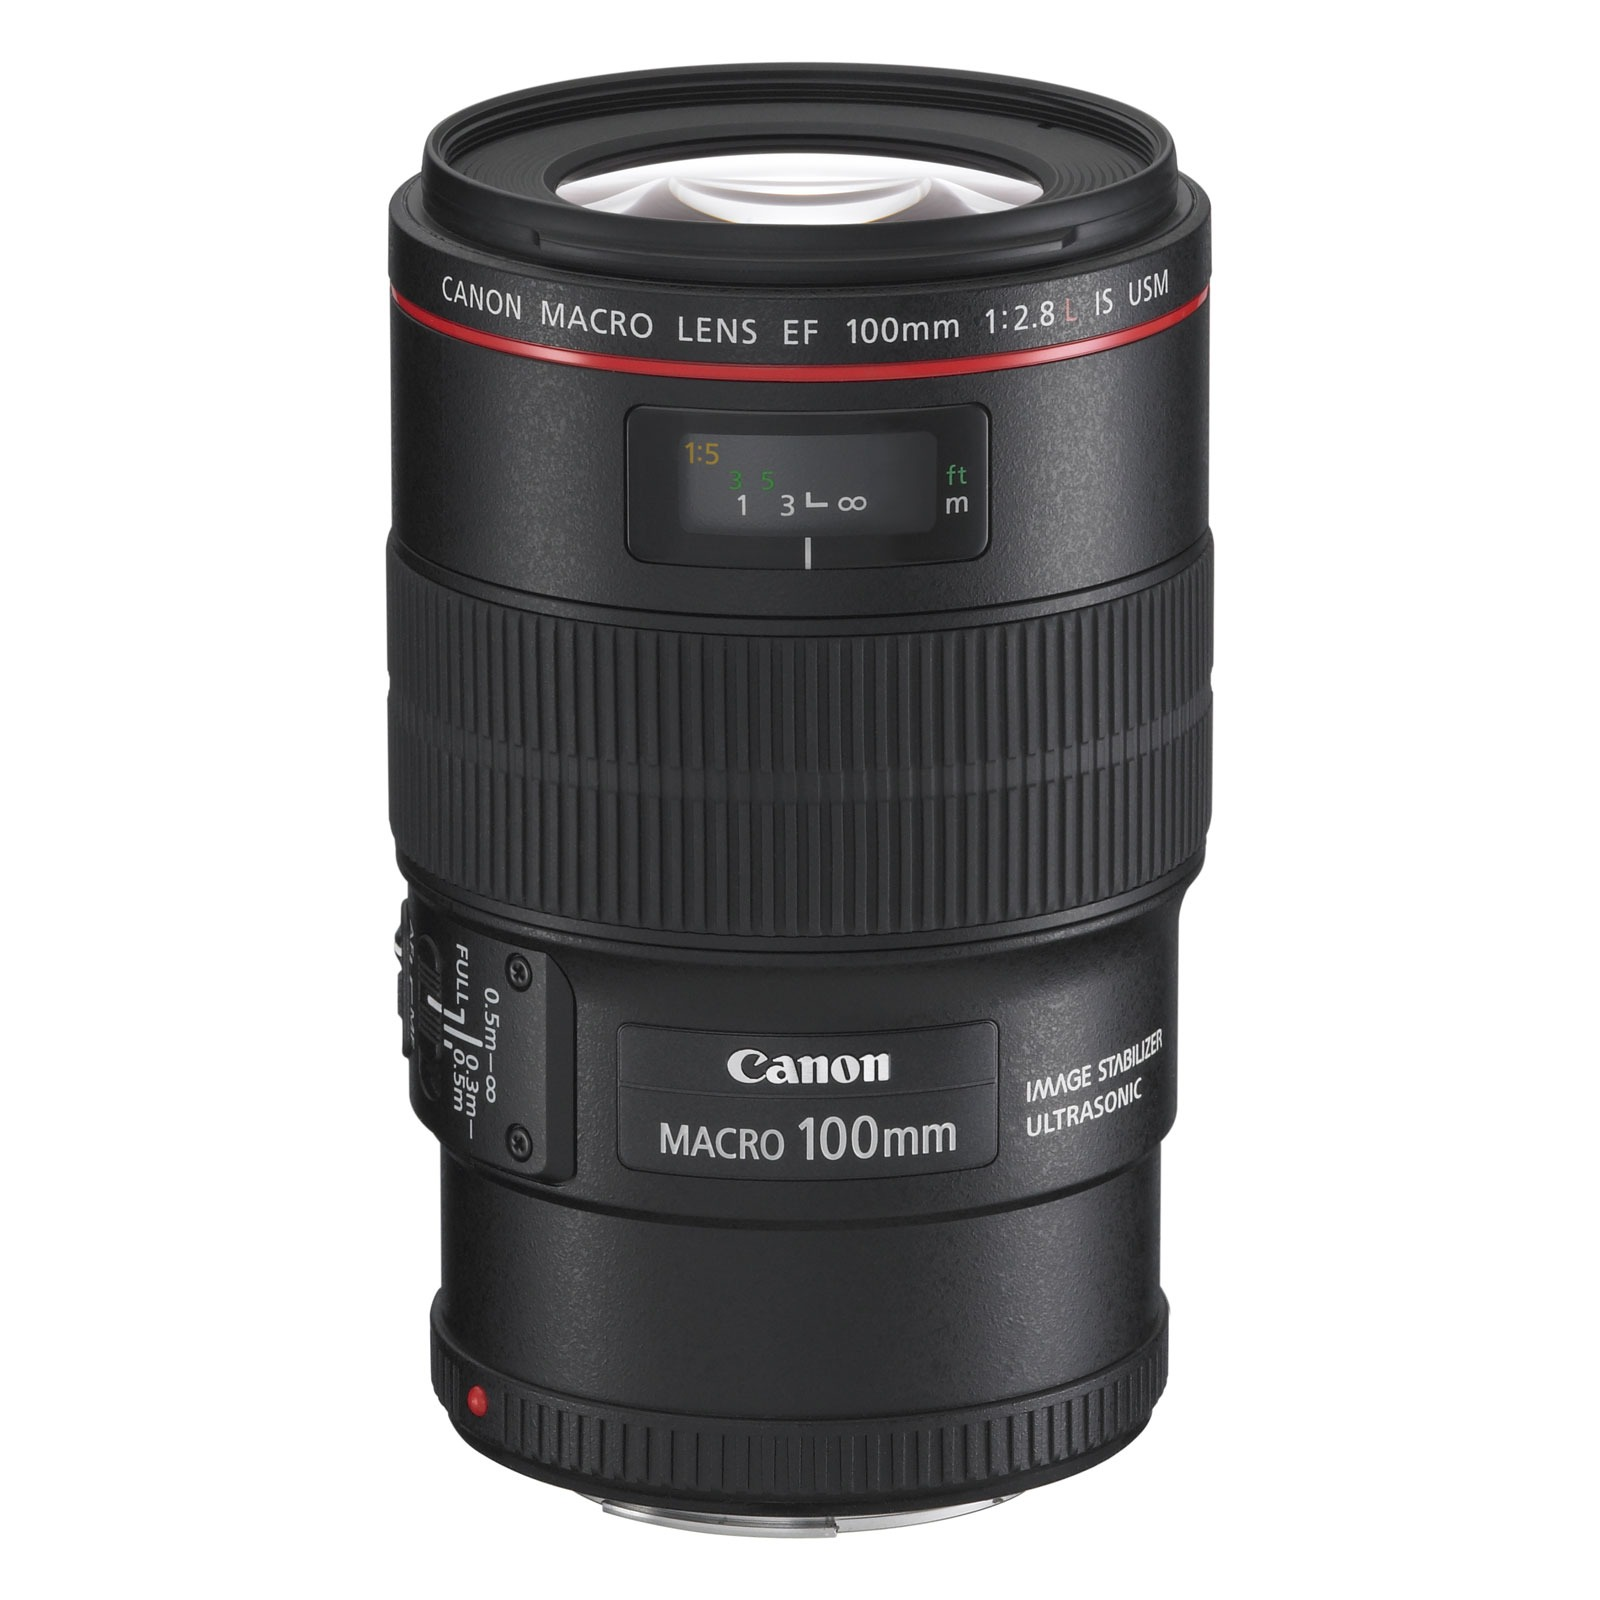 Objectif appareil photo Canon EF 100 mm f/2,8L IS USM Objectif macro